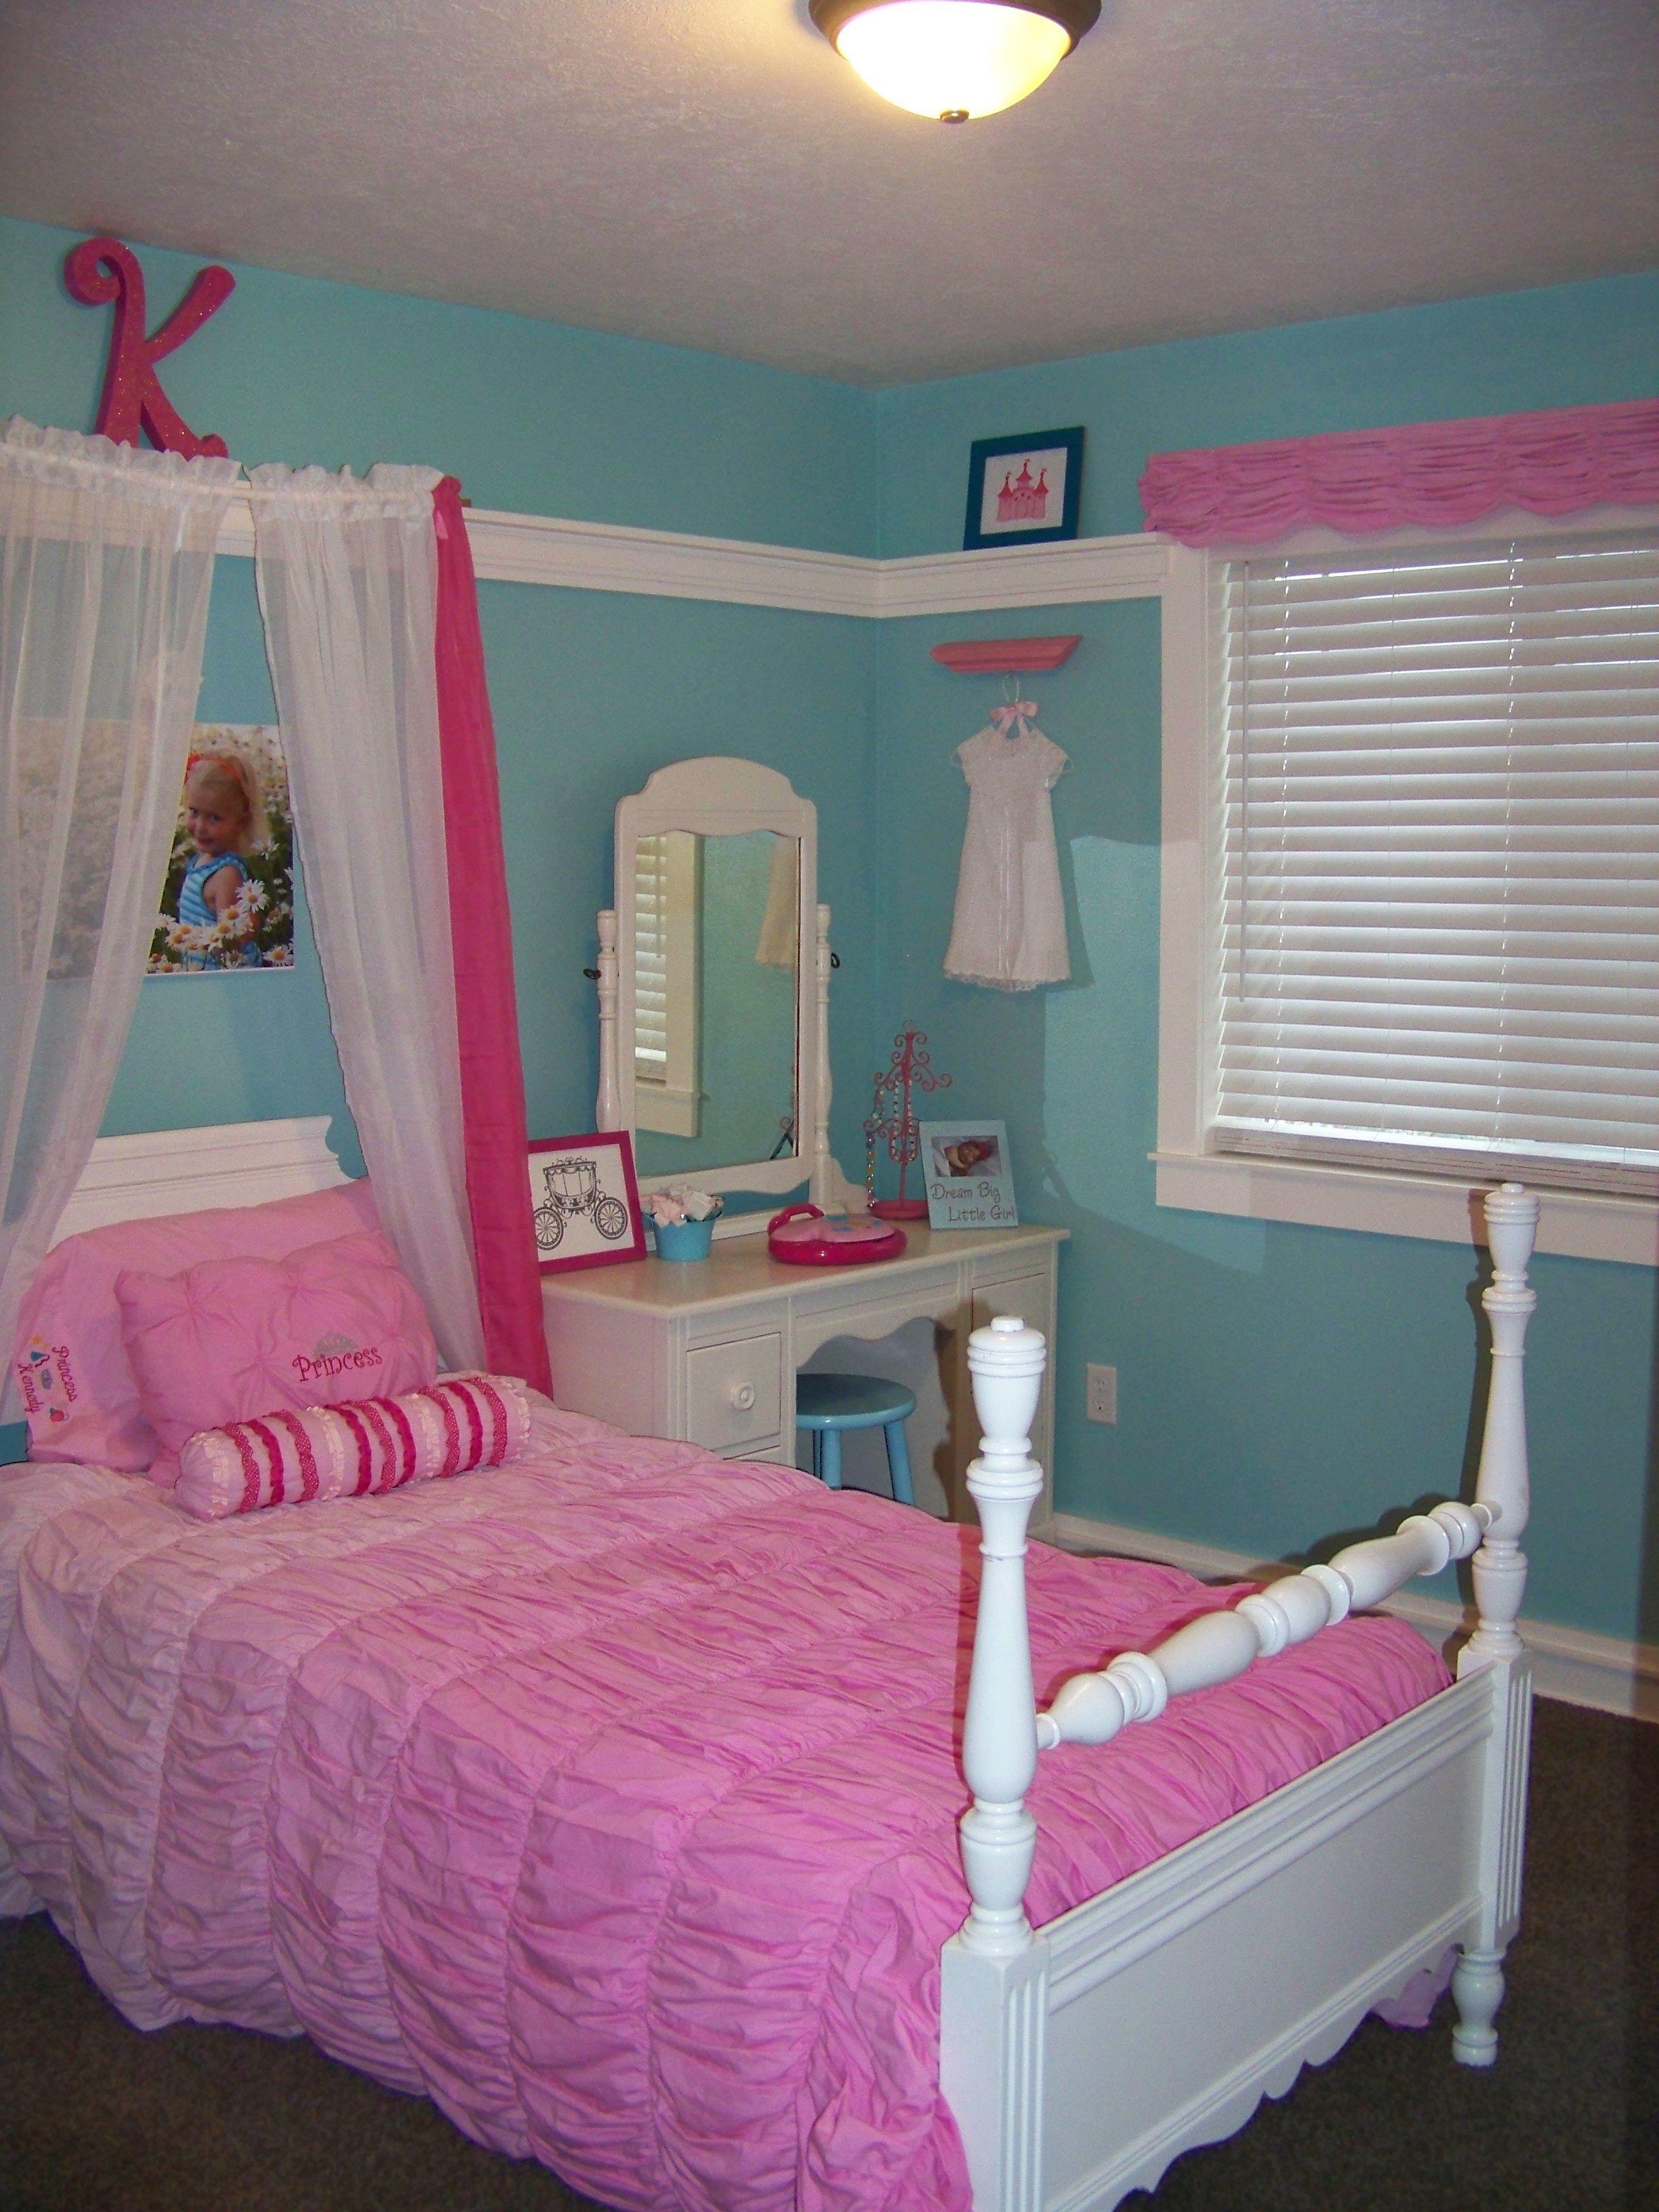 Turquoise And Pink Girl Princess Room Girls Pink Bedroom Pink Bedroom For Girls Girls Bedroom Turquoise Pink Girl Room